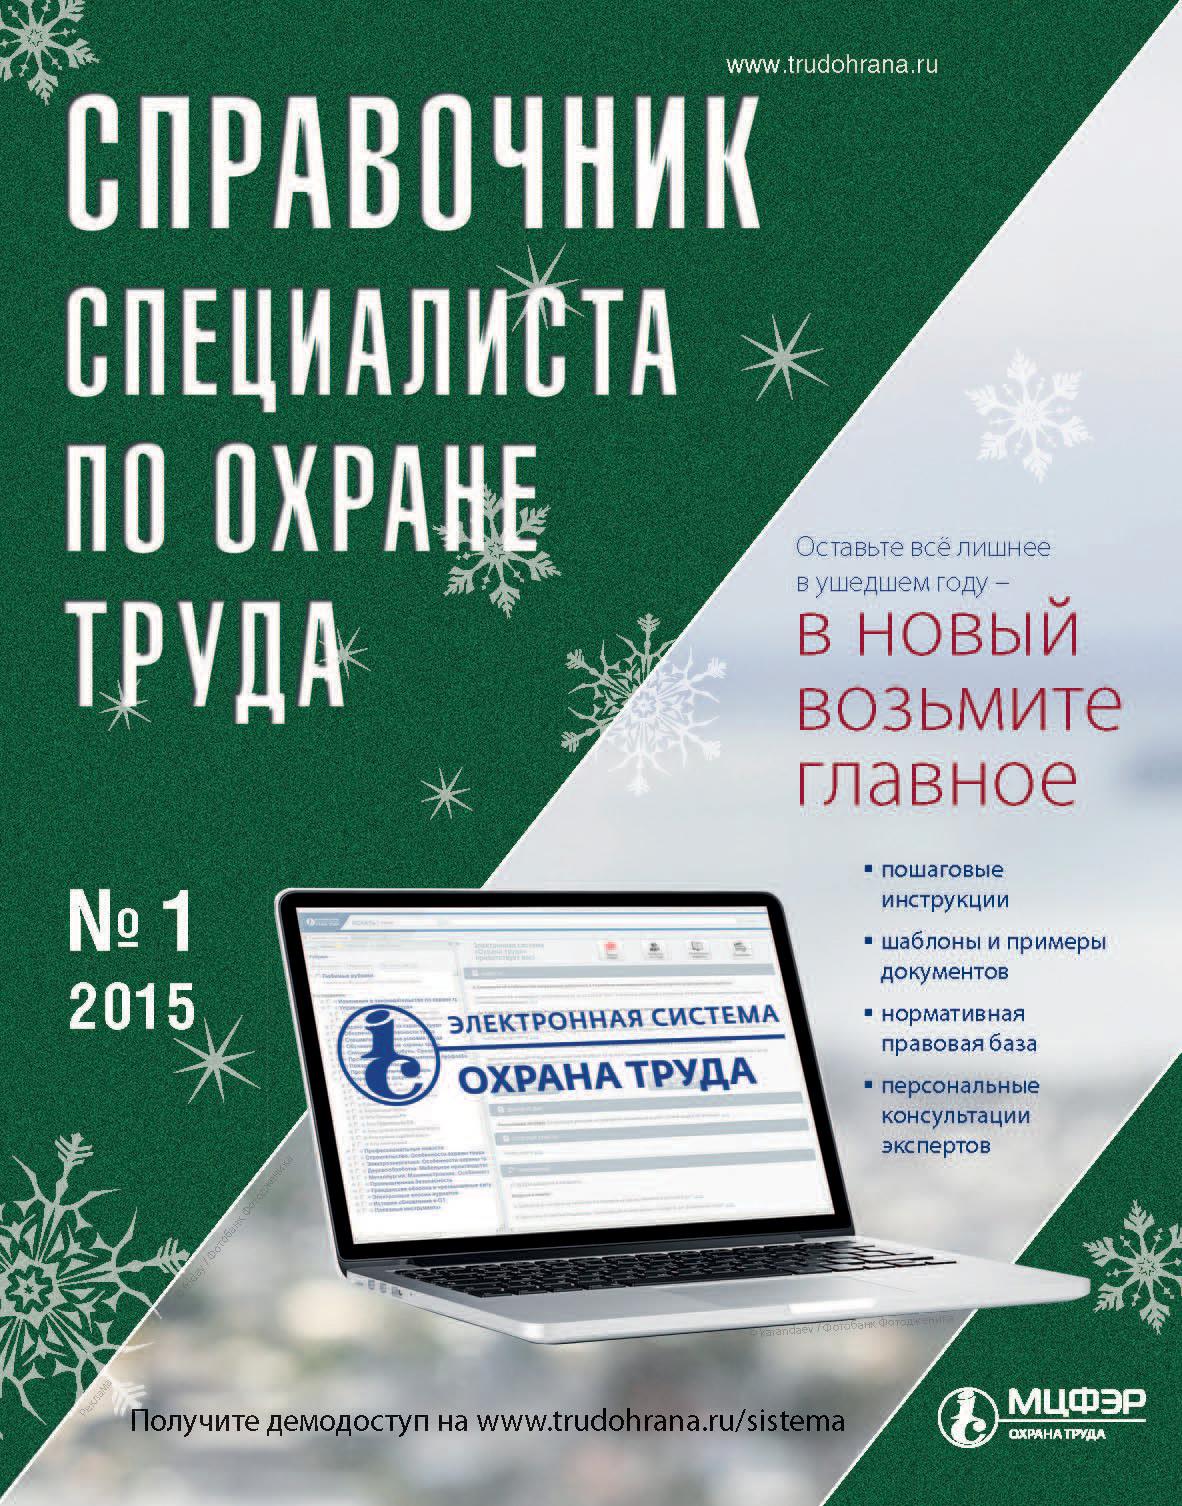 Справочник специалиста по охране труда № 1 2015